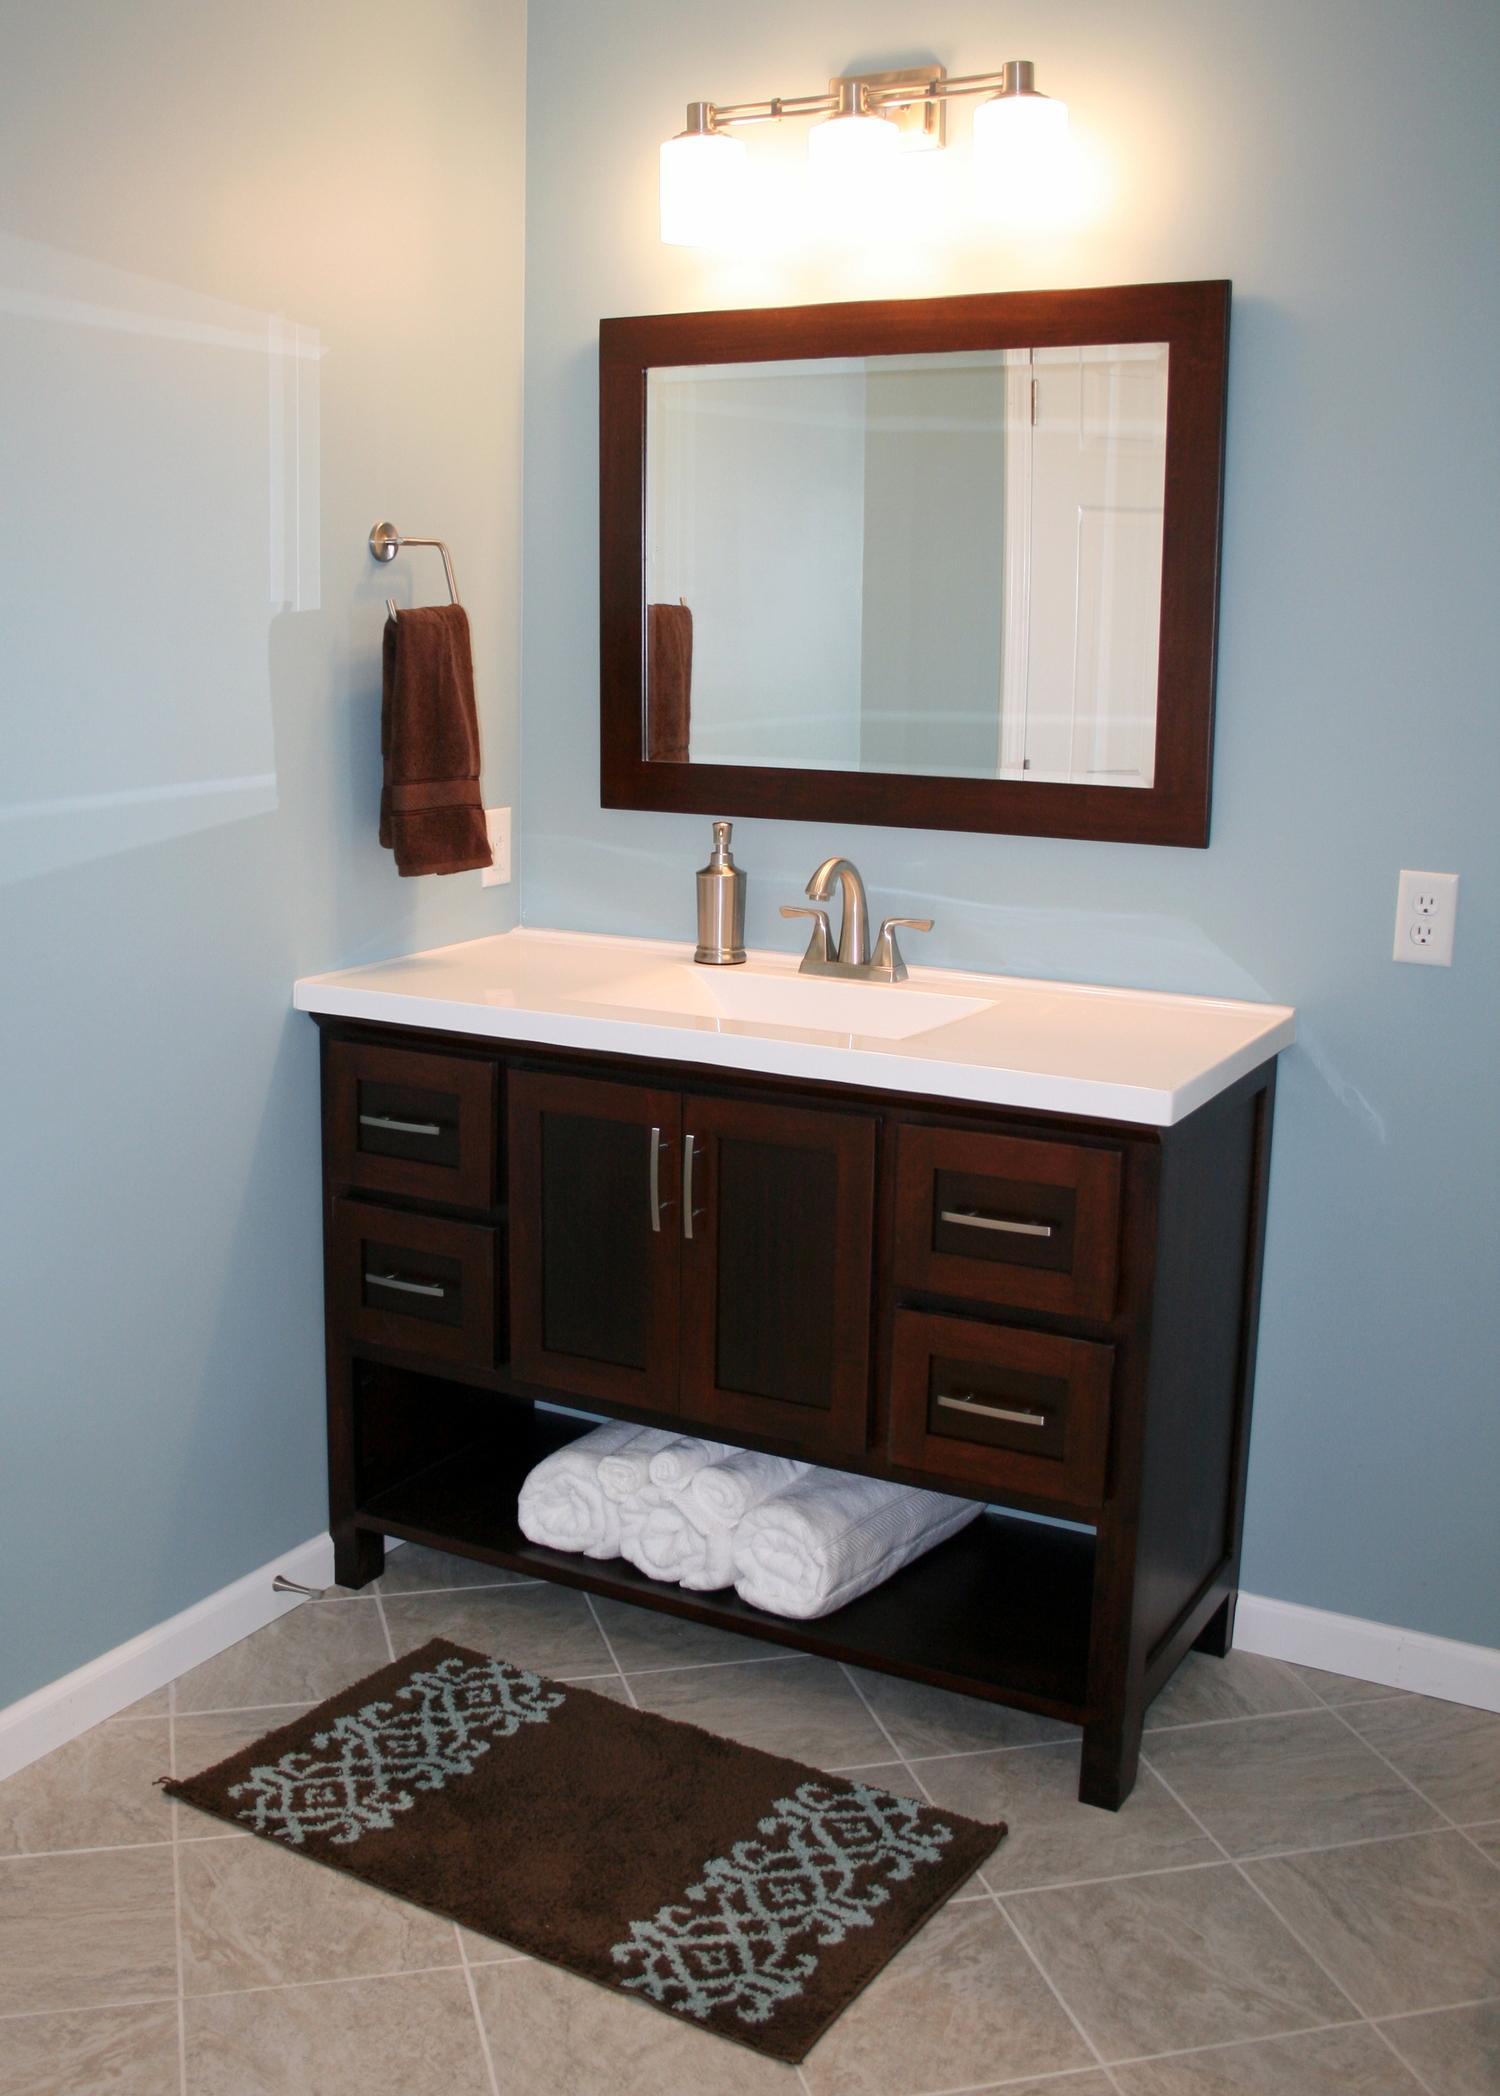 Vanity Towel Rack St Rose Il Dba Custom Woodworking